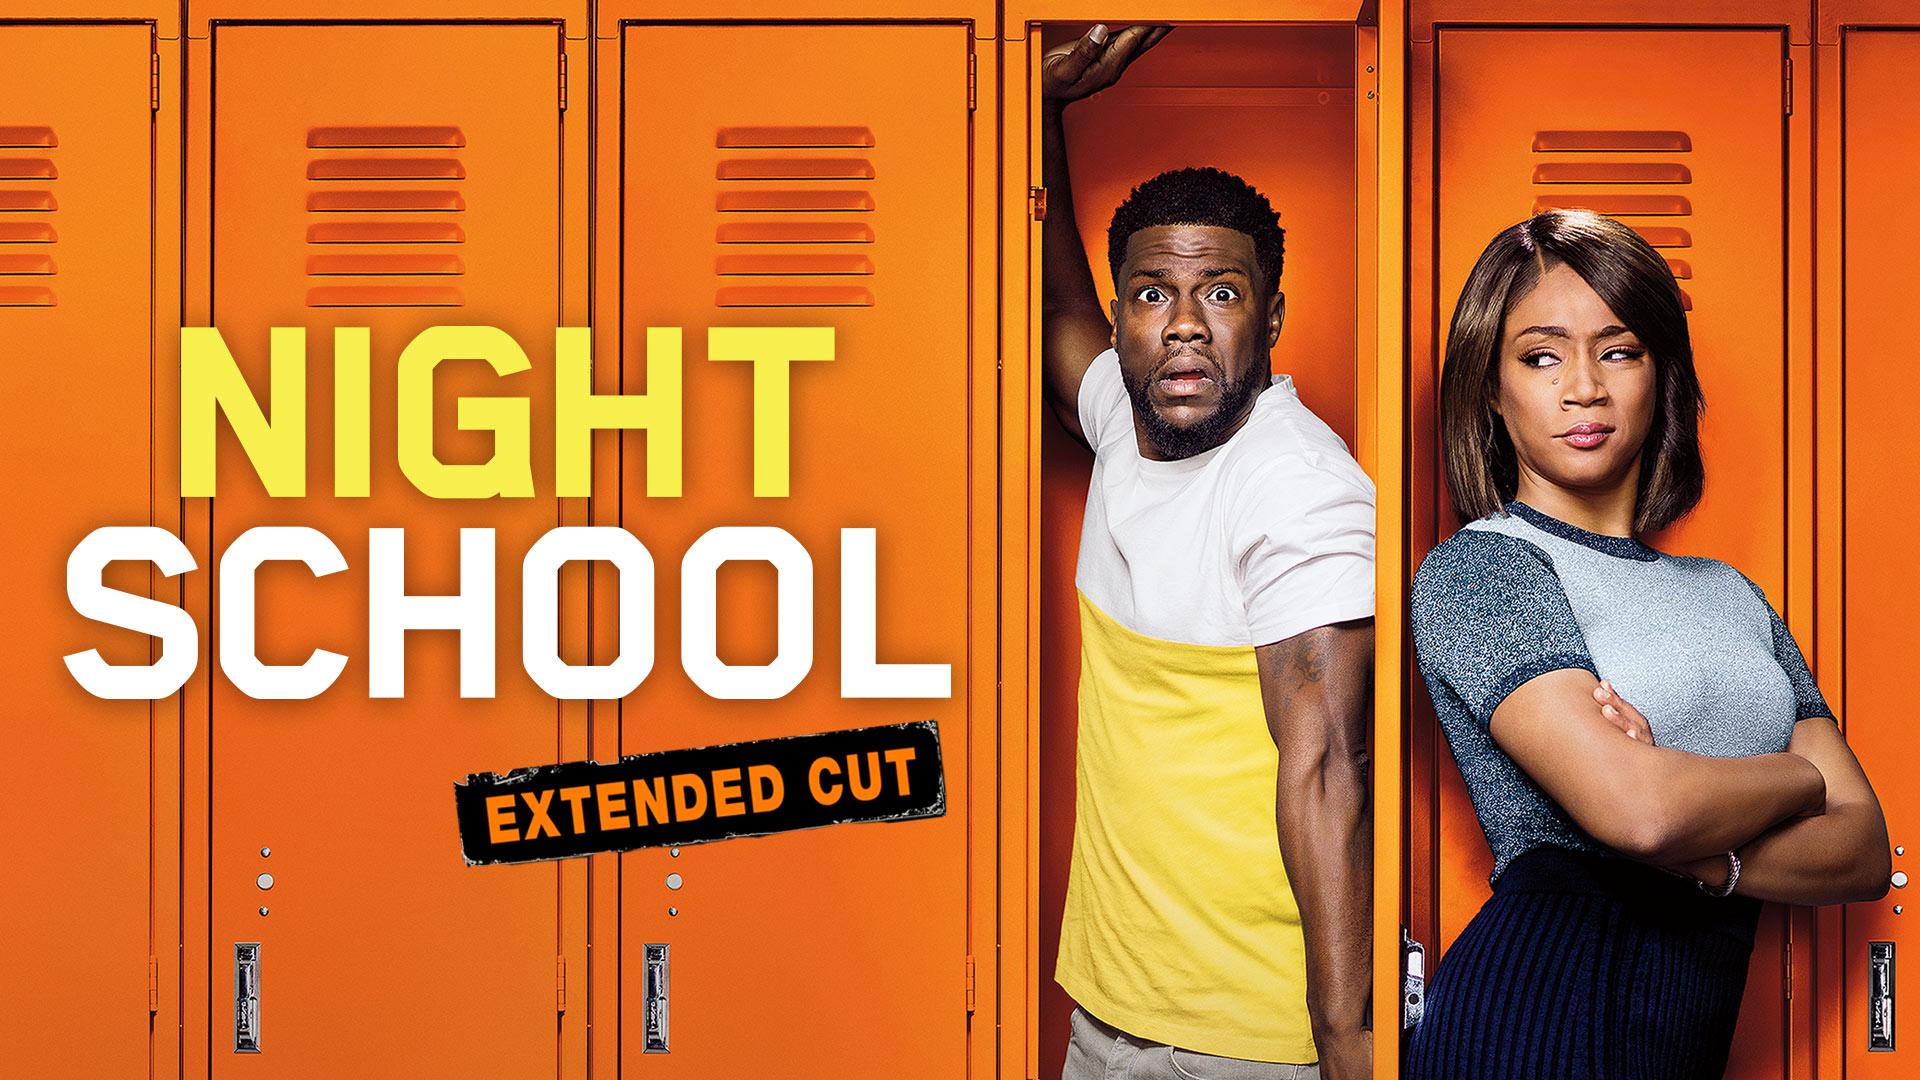 Night School - Extended Cut